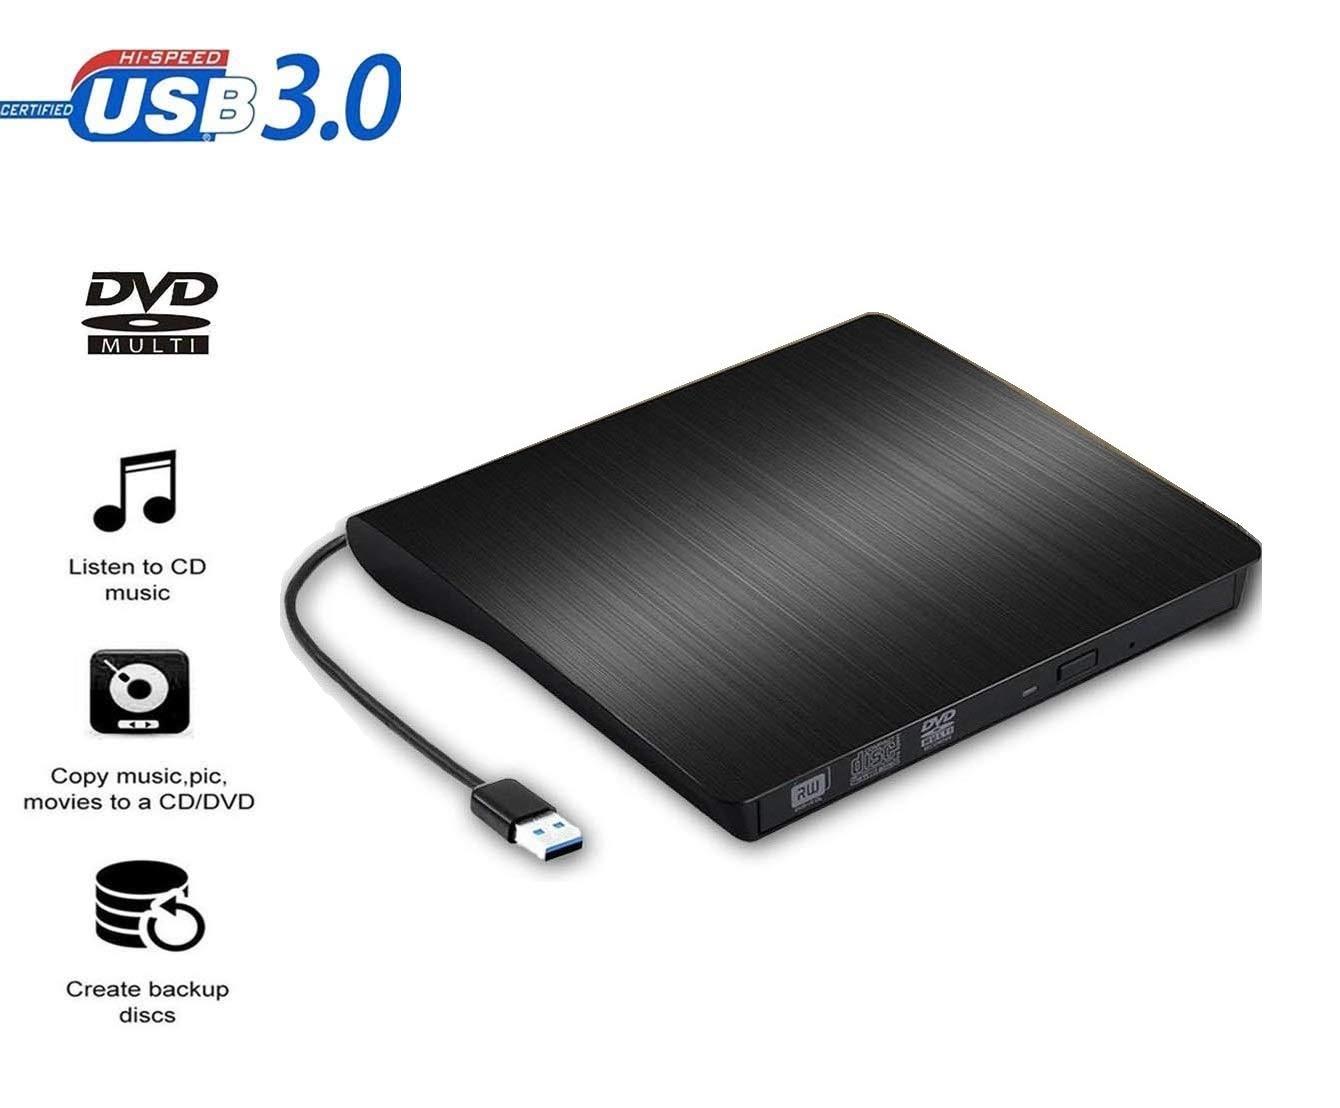 Grabador DVD Externo USB 3.0 | Lector DVD Externo Transferencia de Datos de Alta Velocidad para PC Computadora portátil Computadora de Escritorio MacBook ...